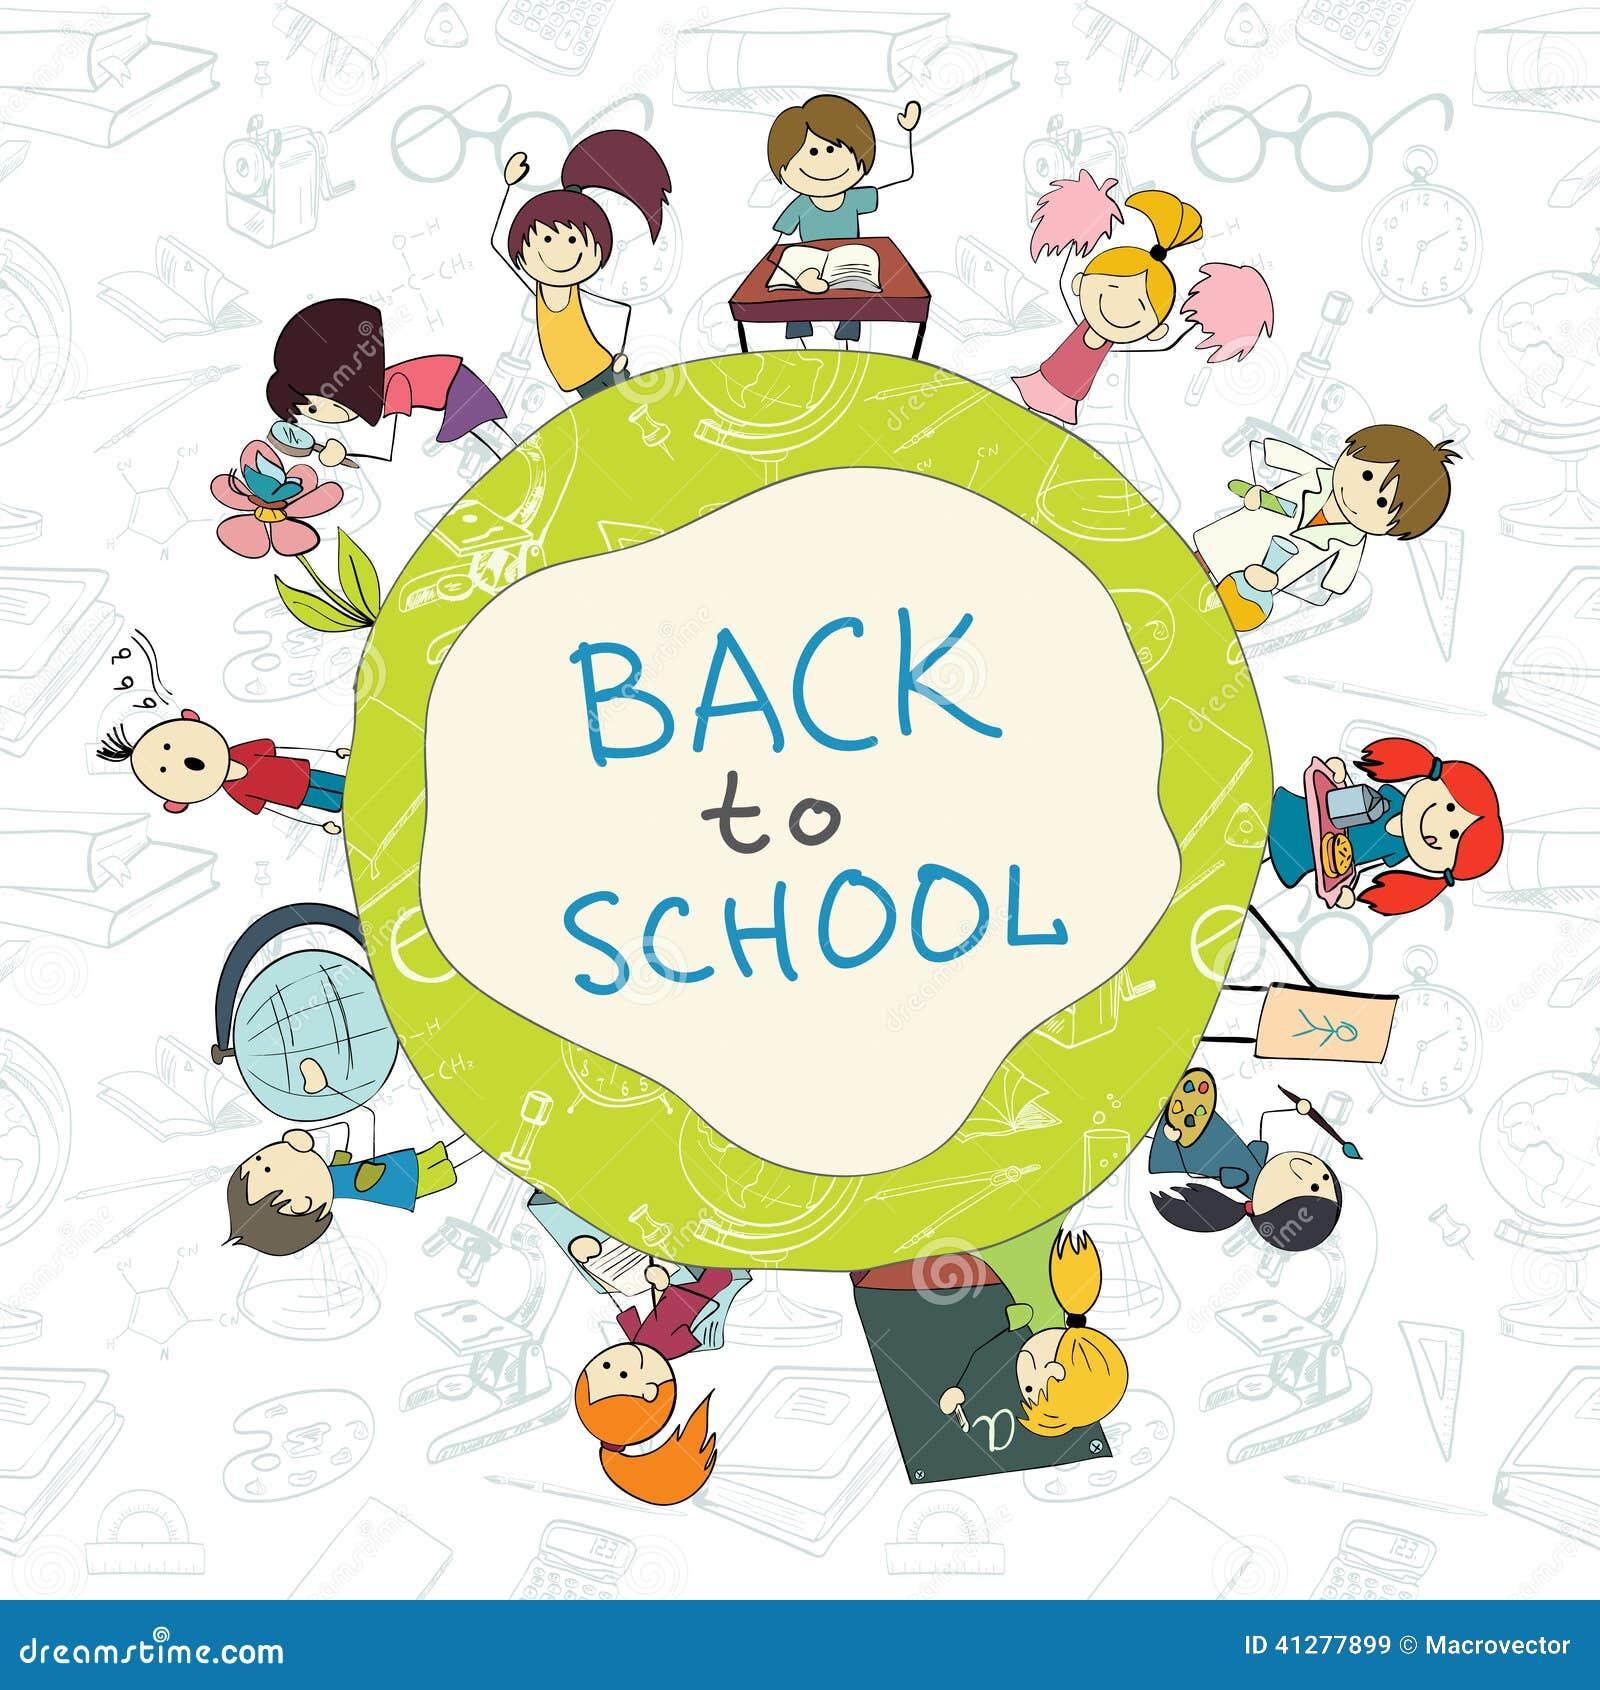 Book Cover Design Cartoon : Kids school emblem sketch poster stock vector image